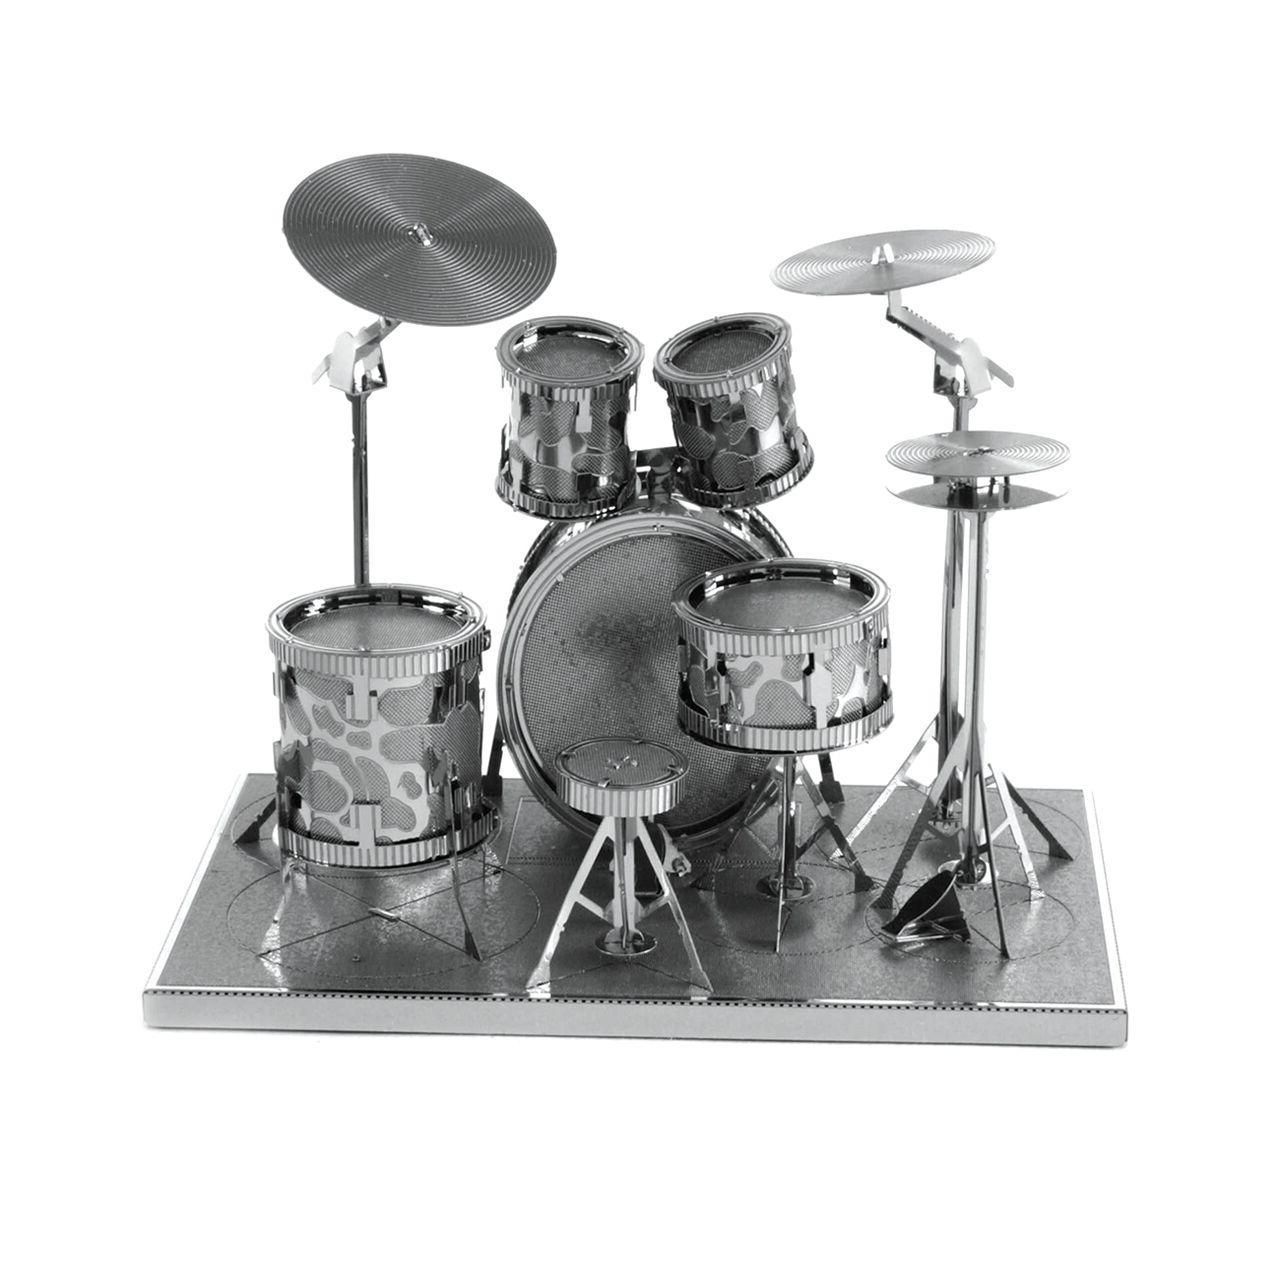 Fascinations Metal Drum Set Cut Steel Instrument Model Kit